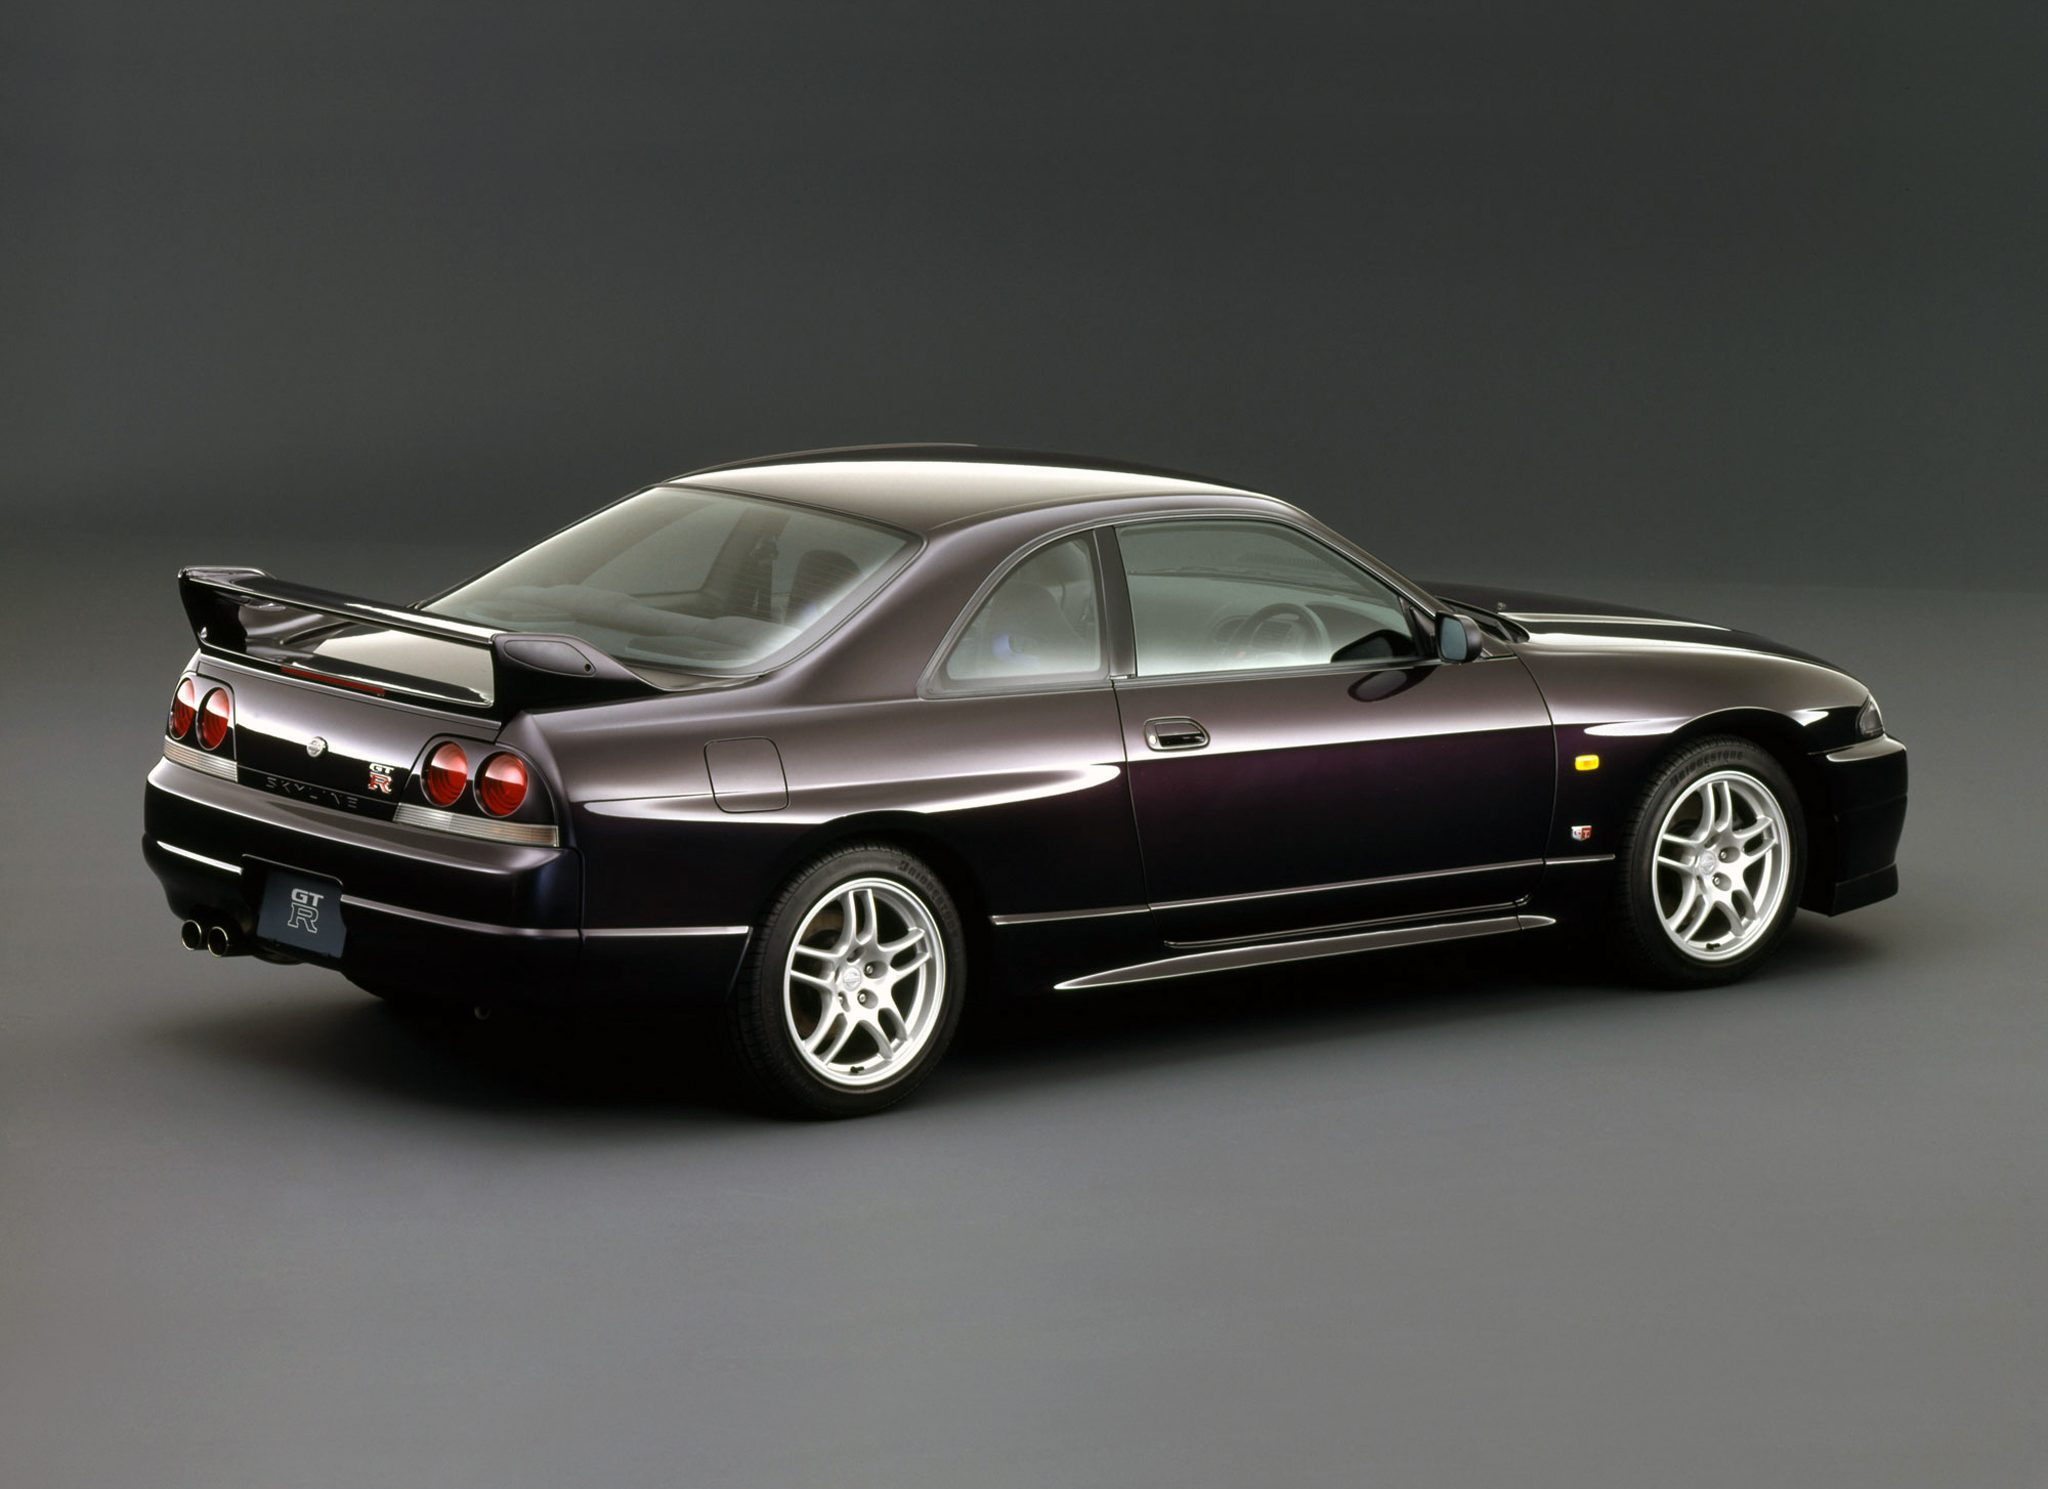 1995 Nissan skyline R33